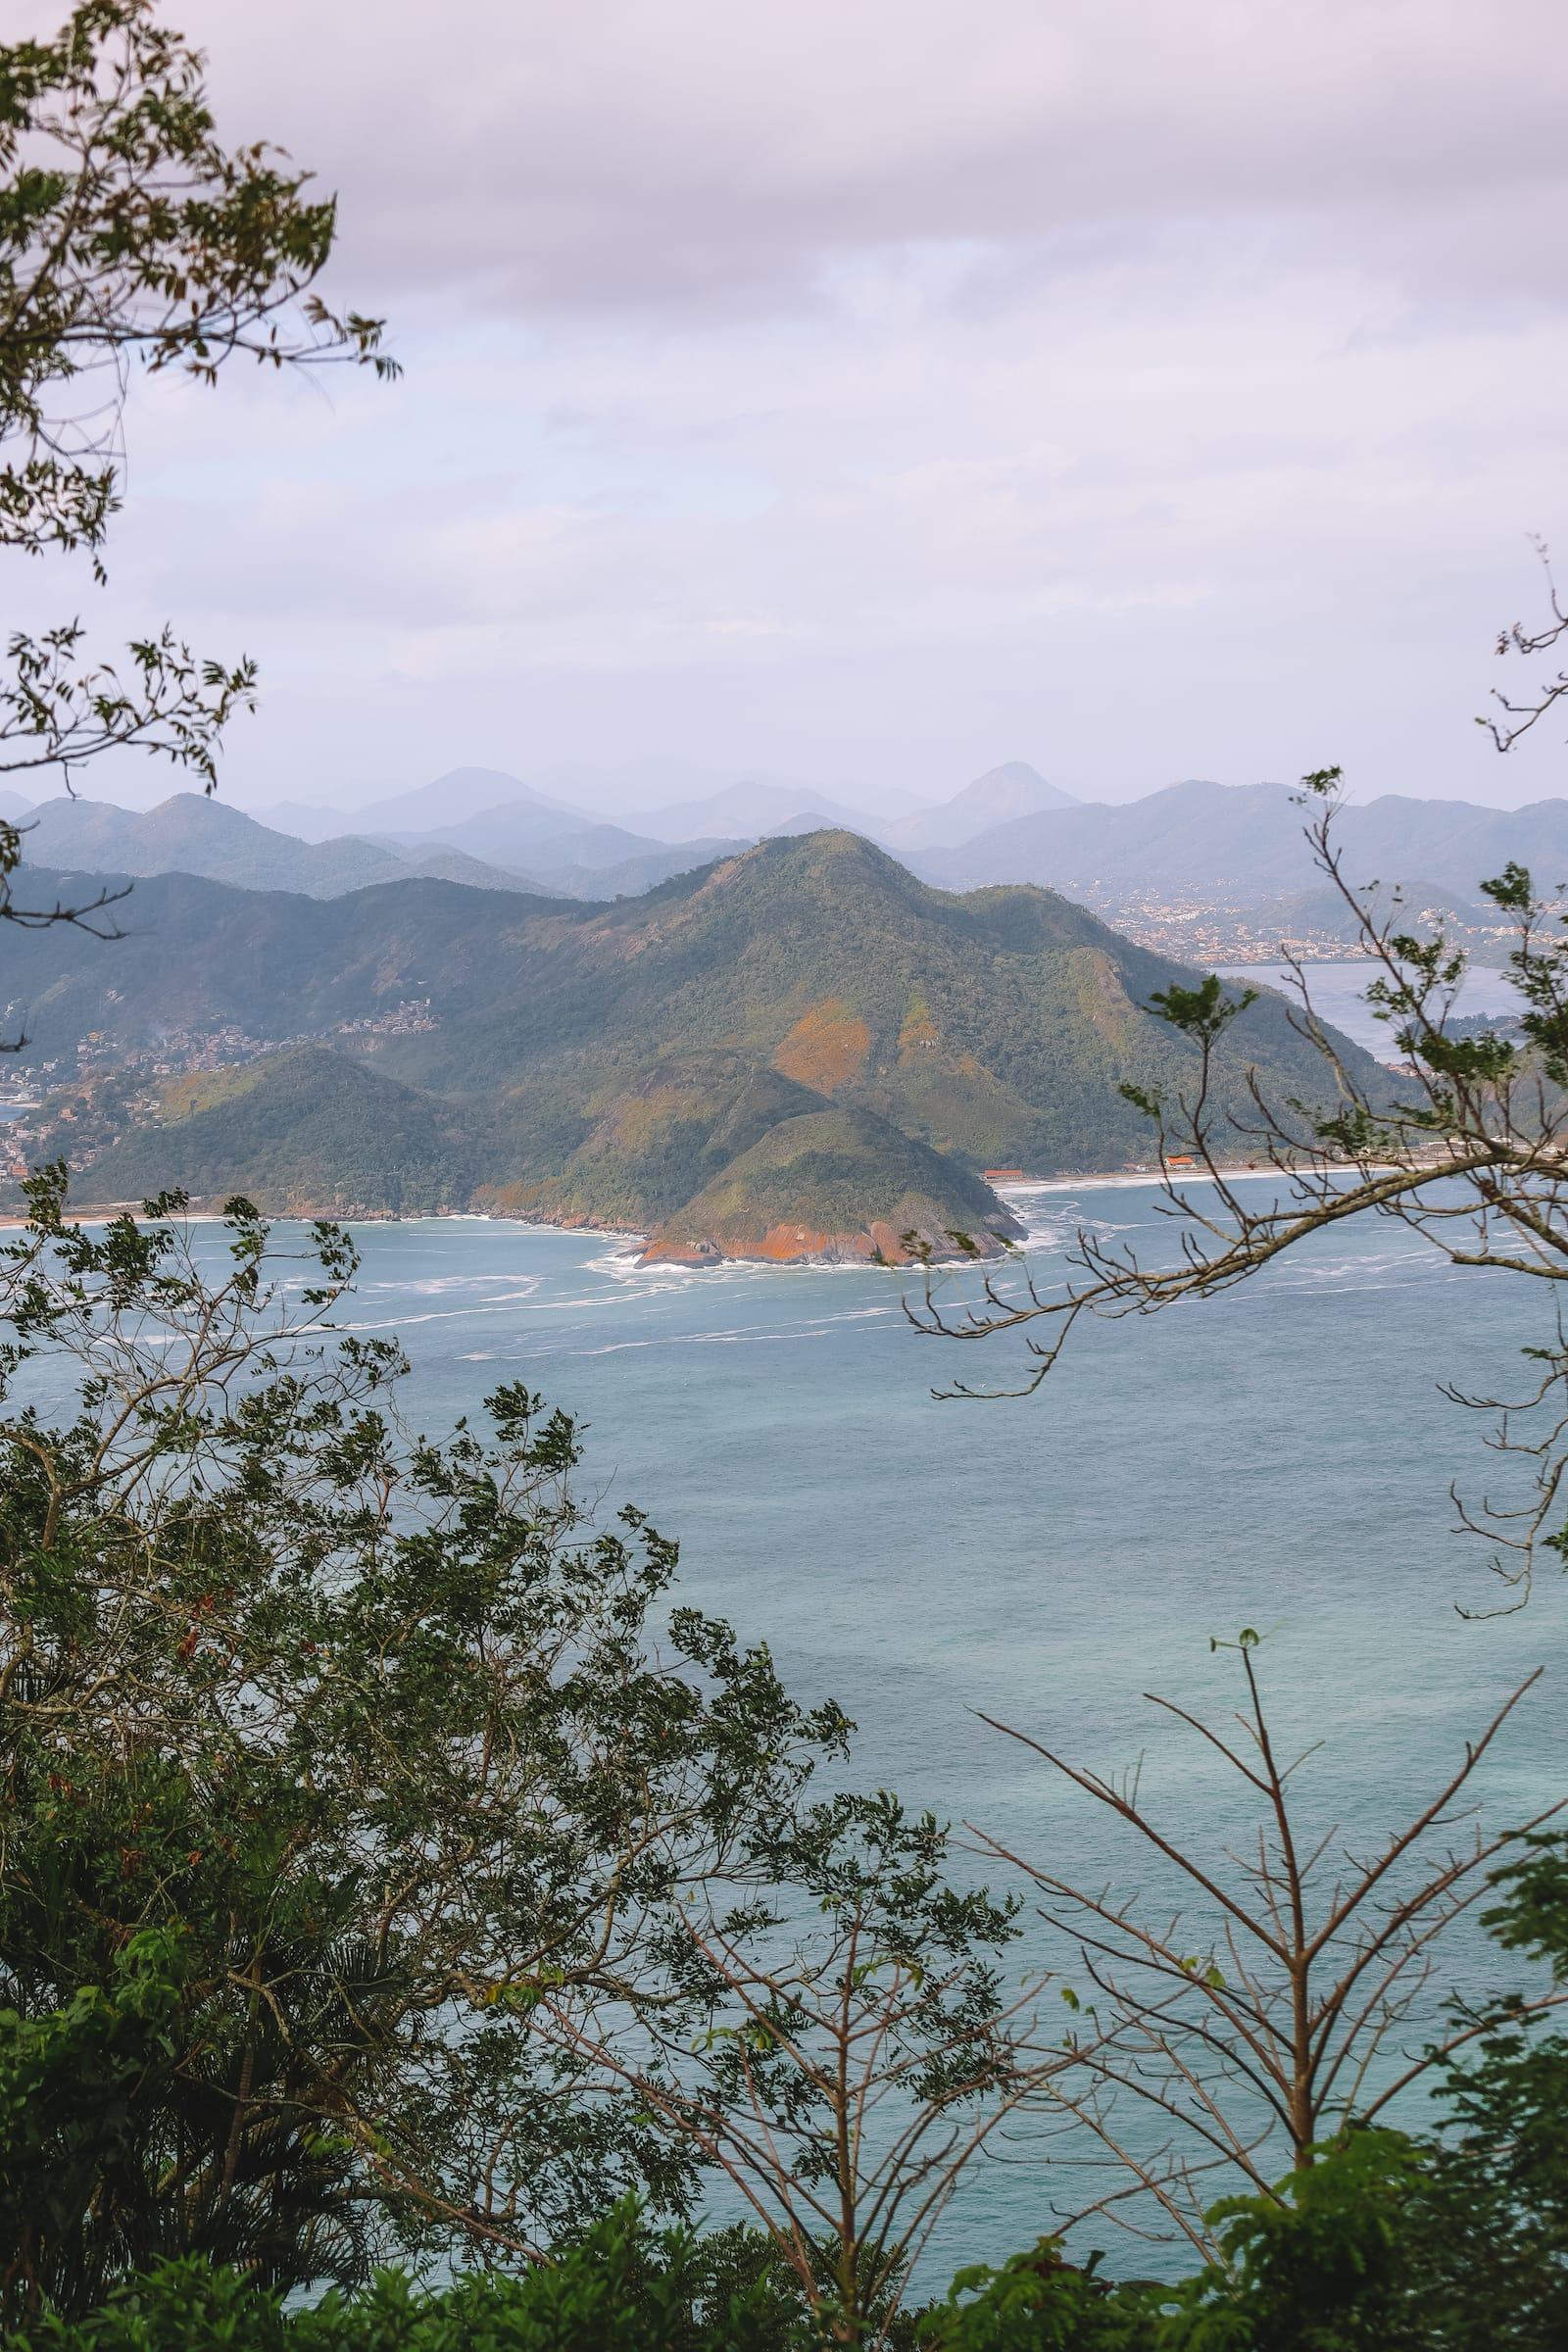 Photos And Postcards From Rio De Janeiro, Brazil (21)